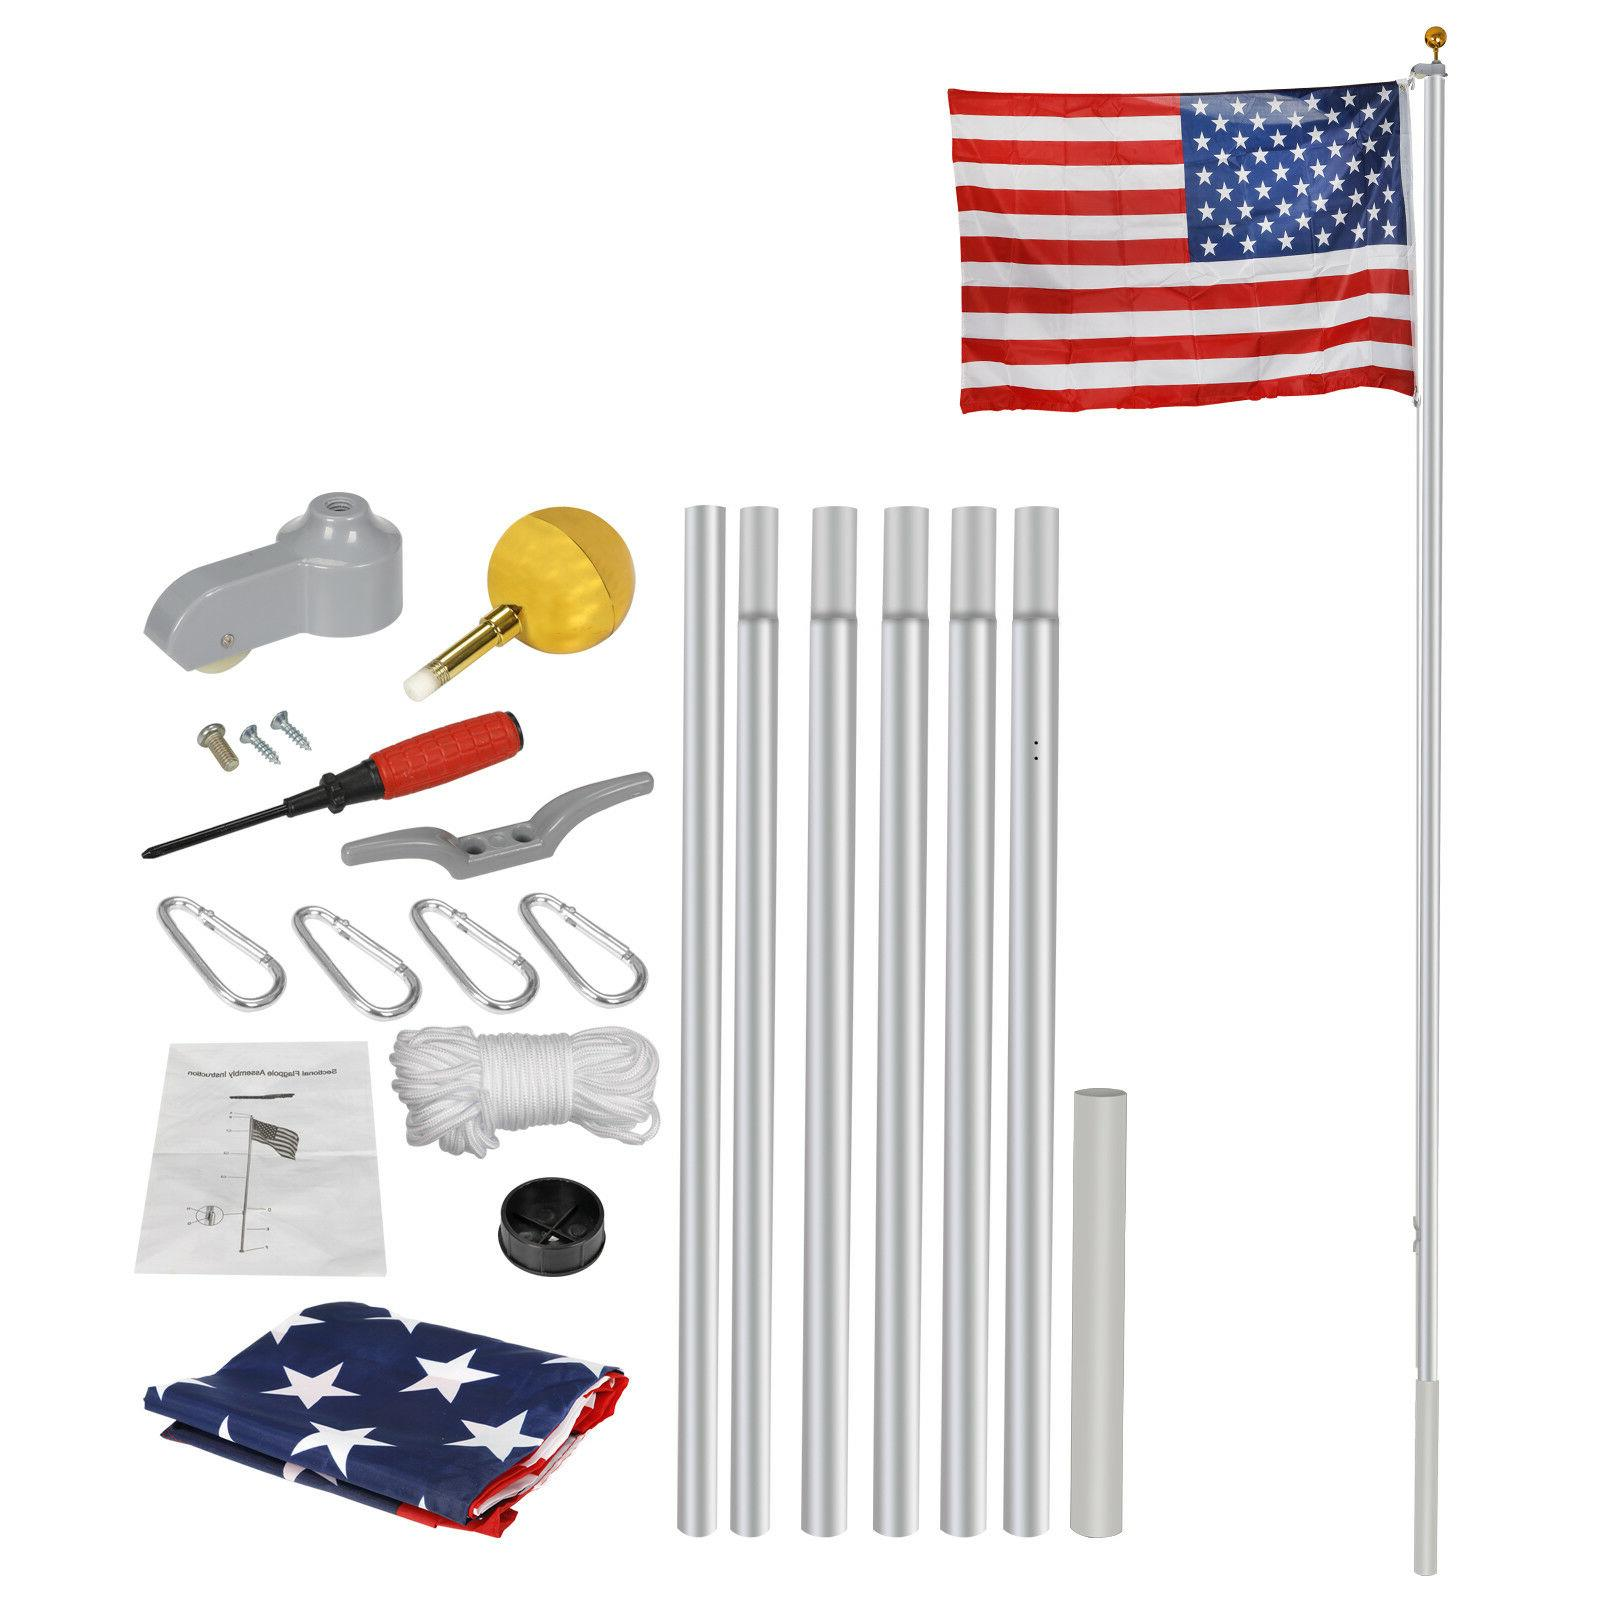 Heavy Duty 20 Ft Aluminum Outdoor Flag Pole Kit With 1 Free